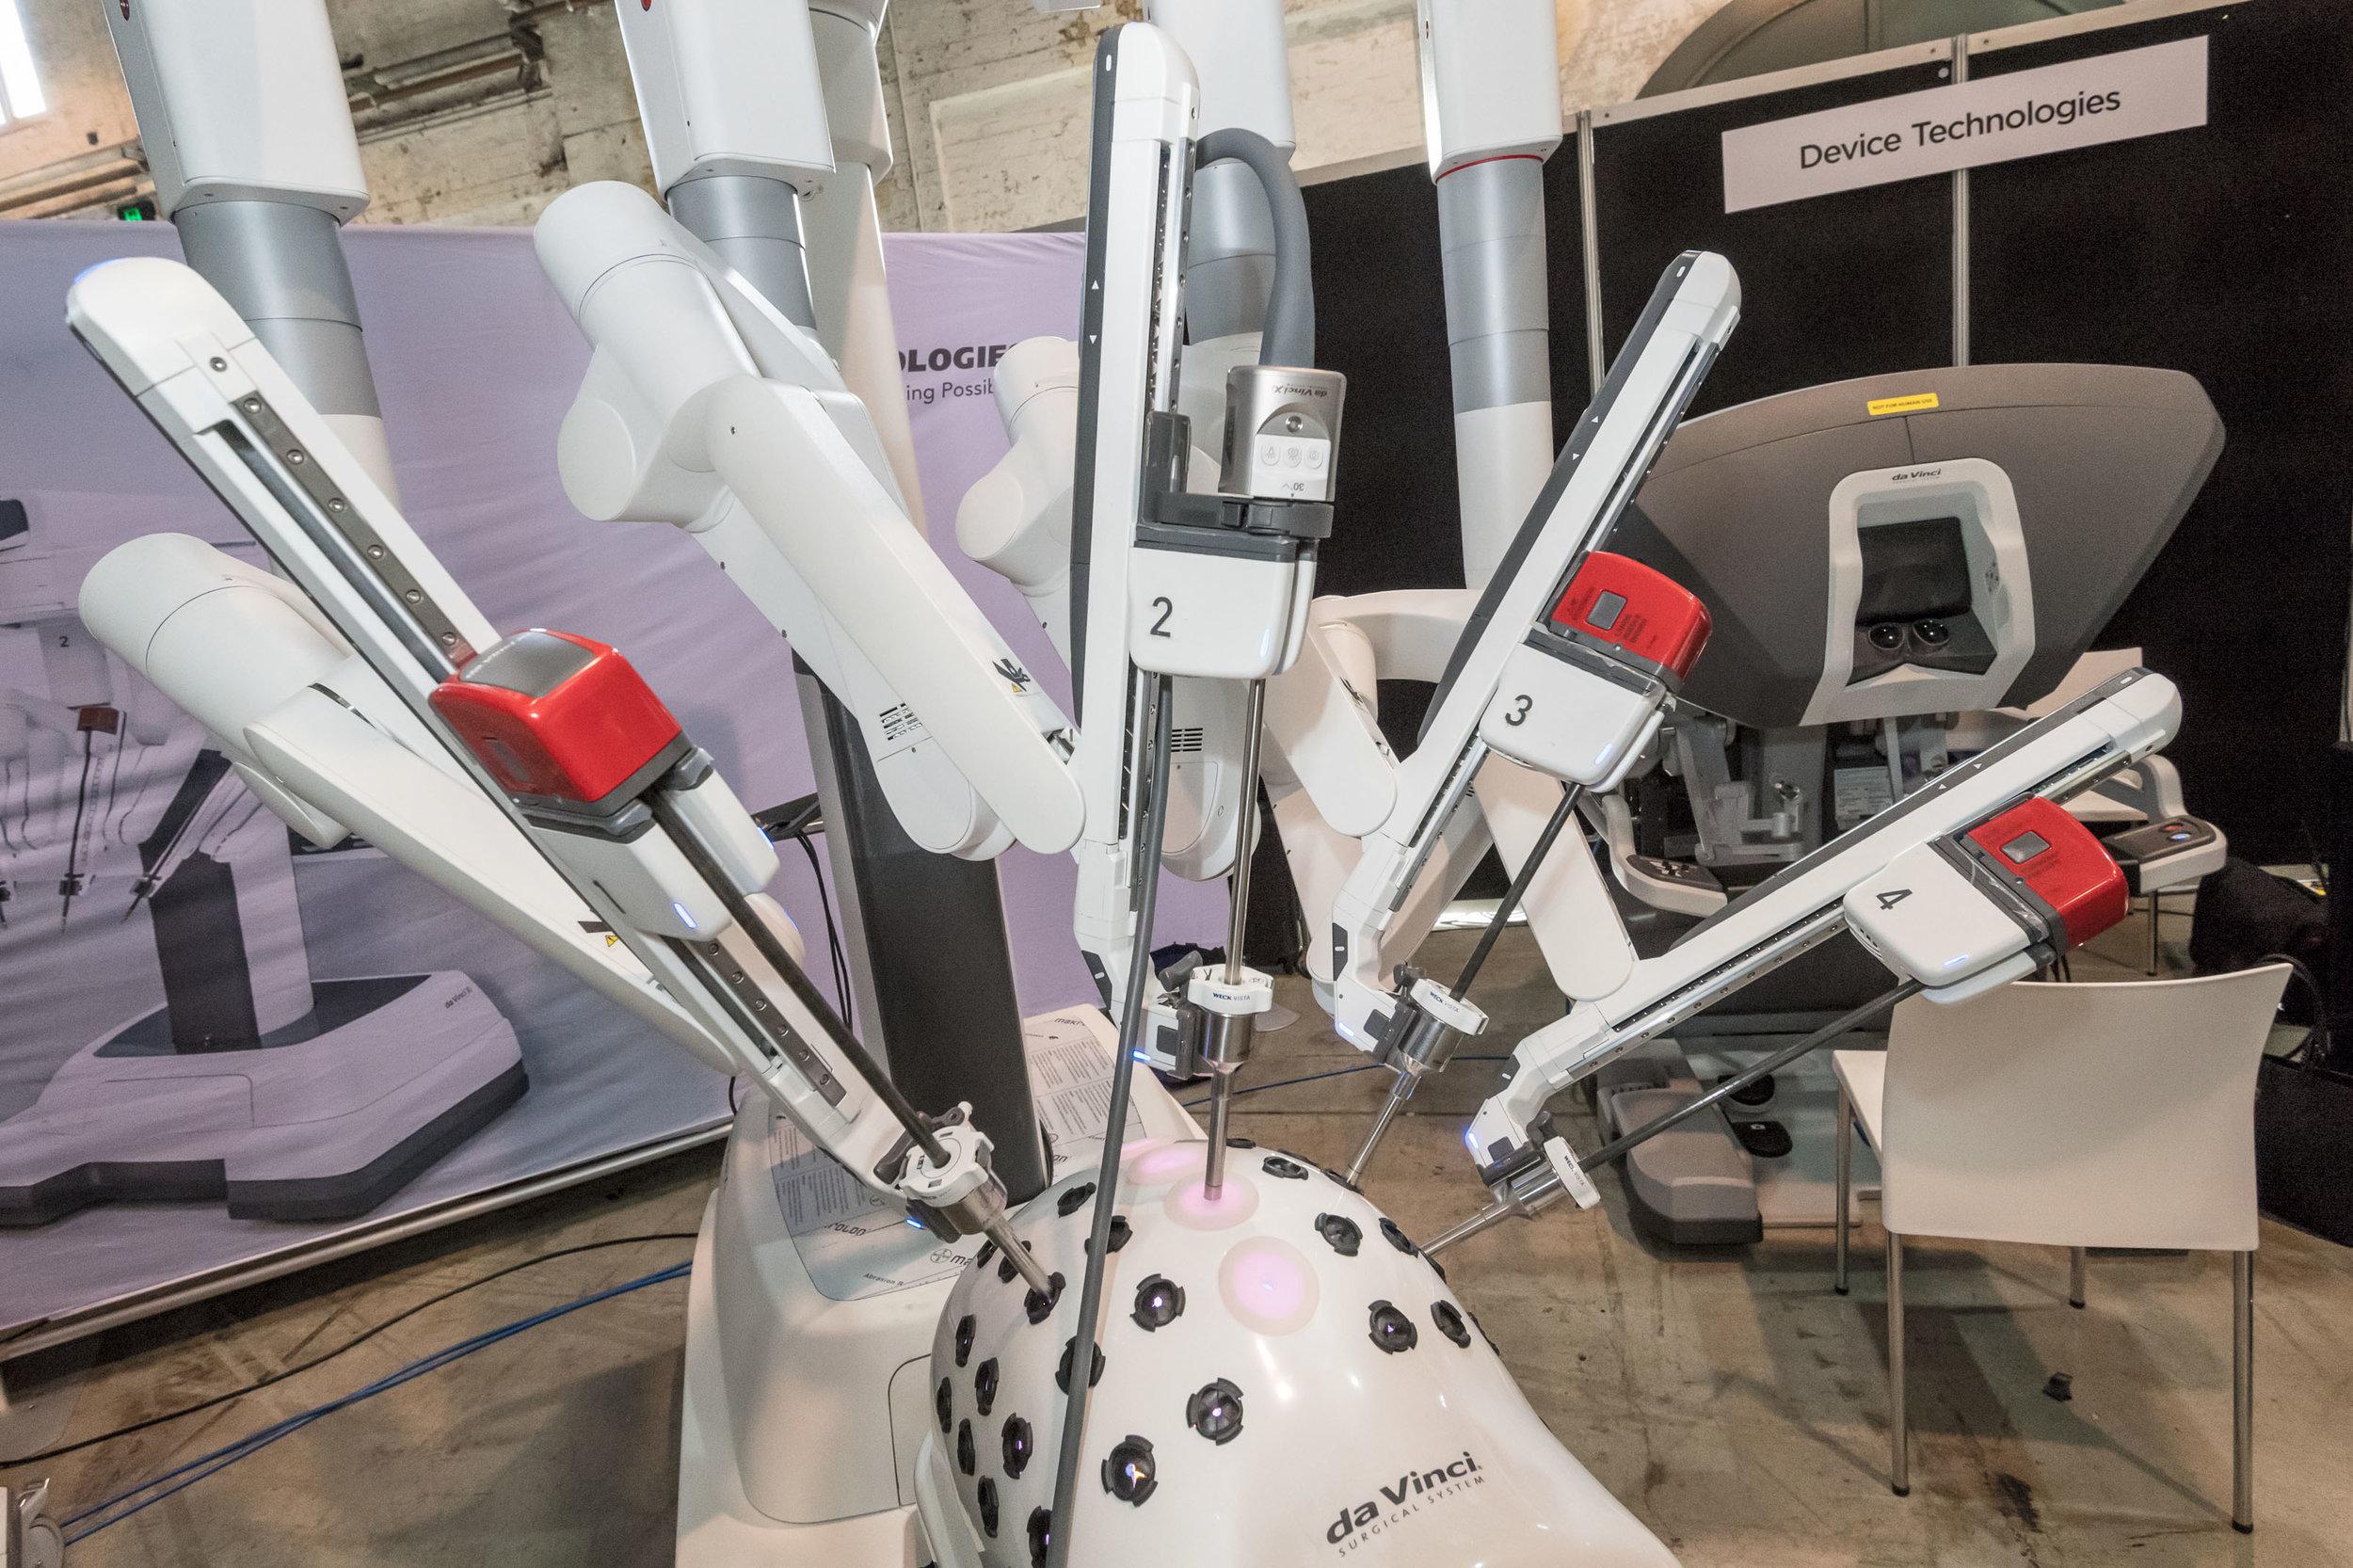 83342 Robotic Symposium Sat 20180623 WS1 Pro_172092.jpg